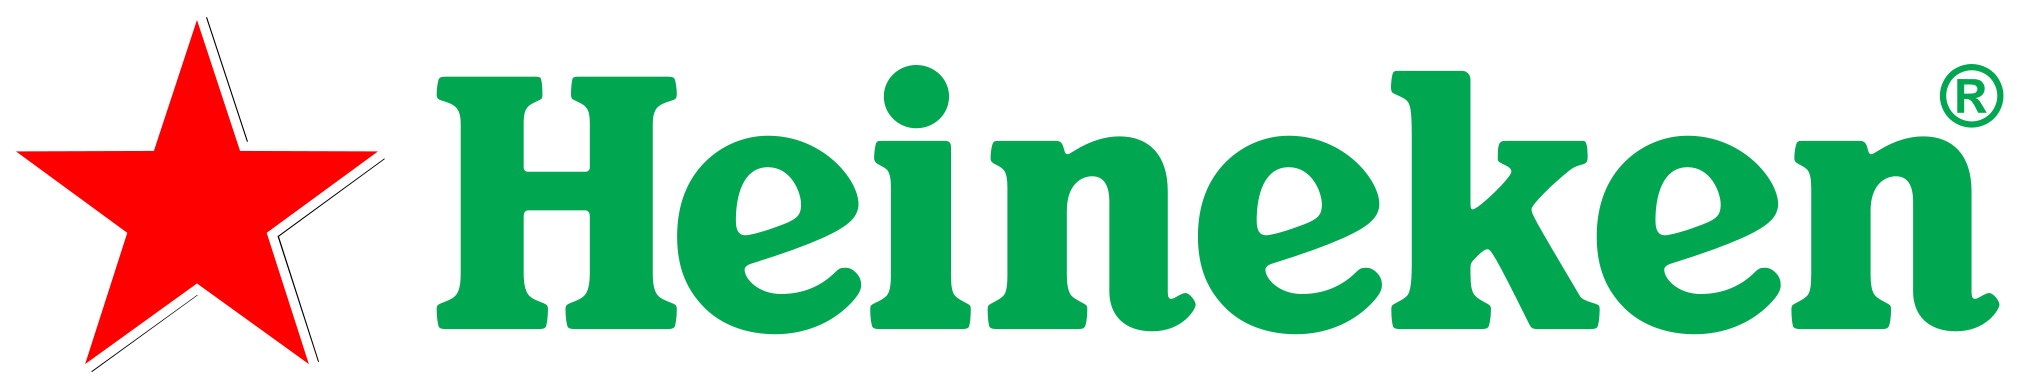 Heineken-logo -- 2272x1704.png